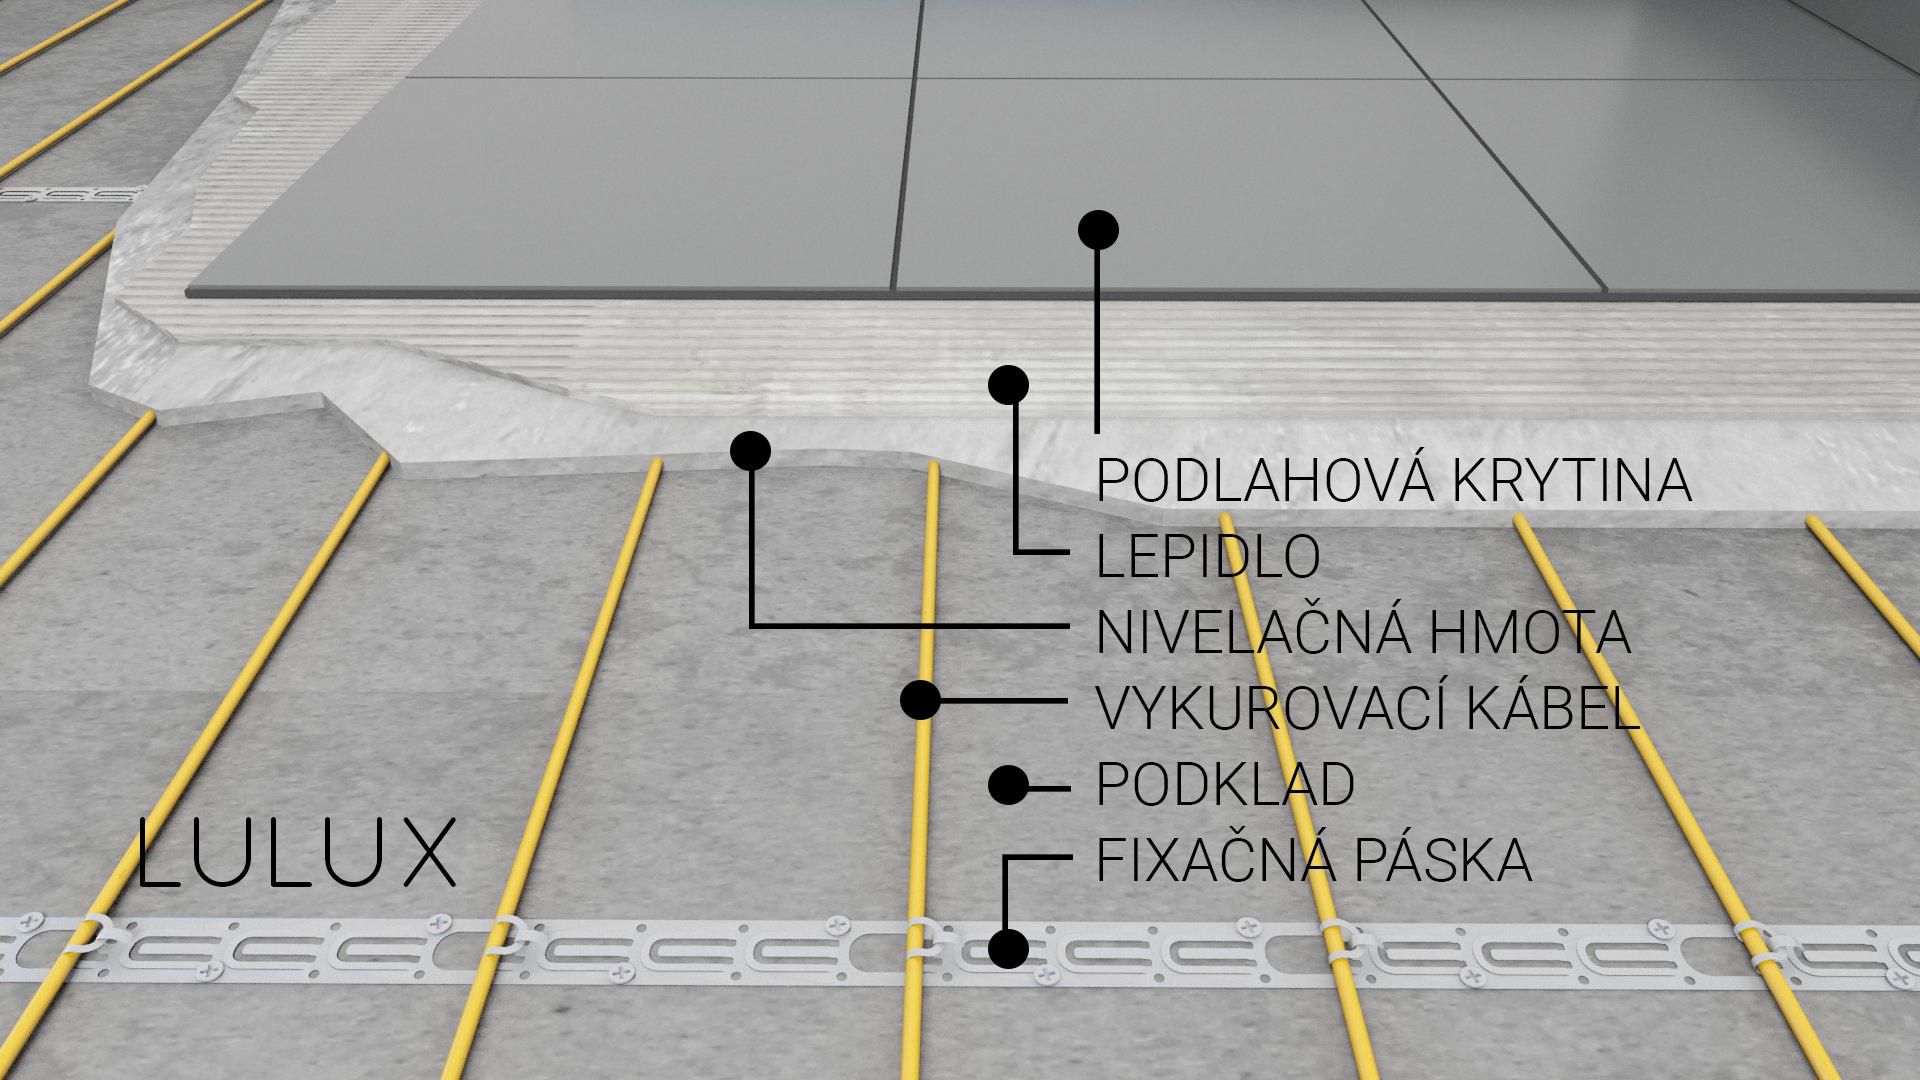 dvojzilovy-vykurovaci-kabel--vrstvy-2-skladba